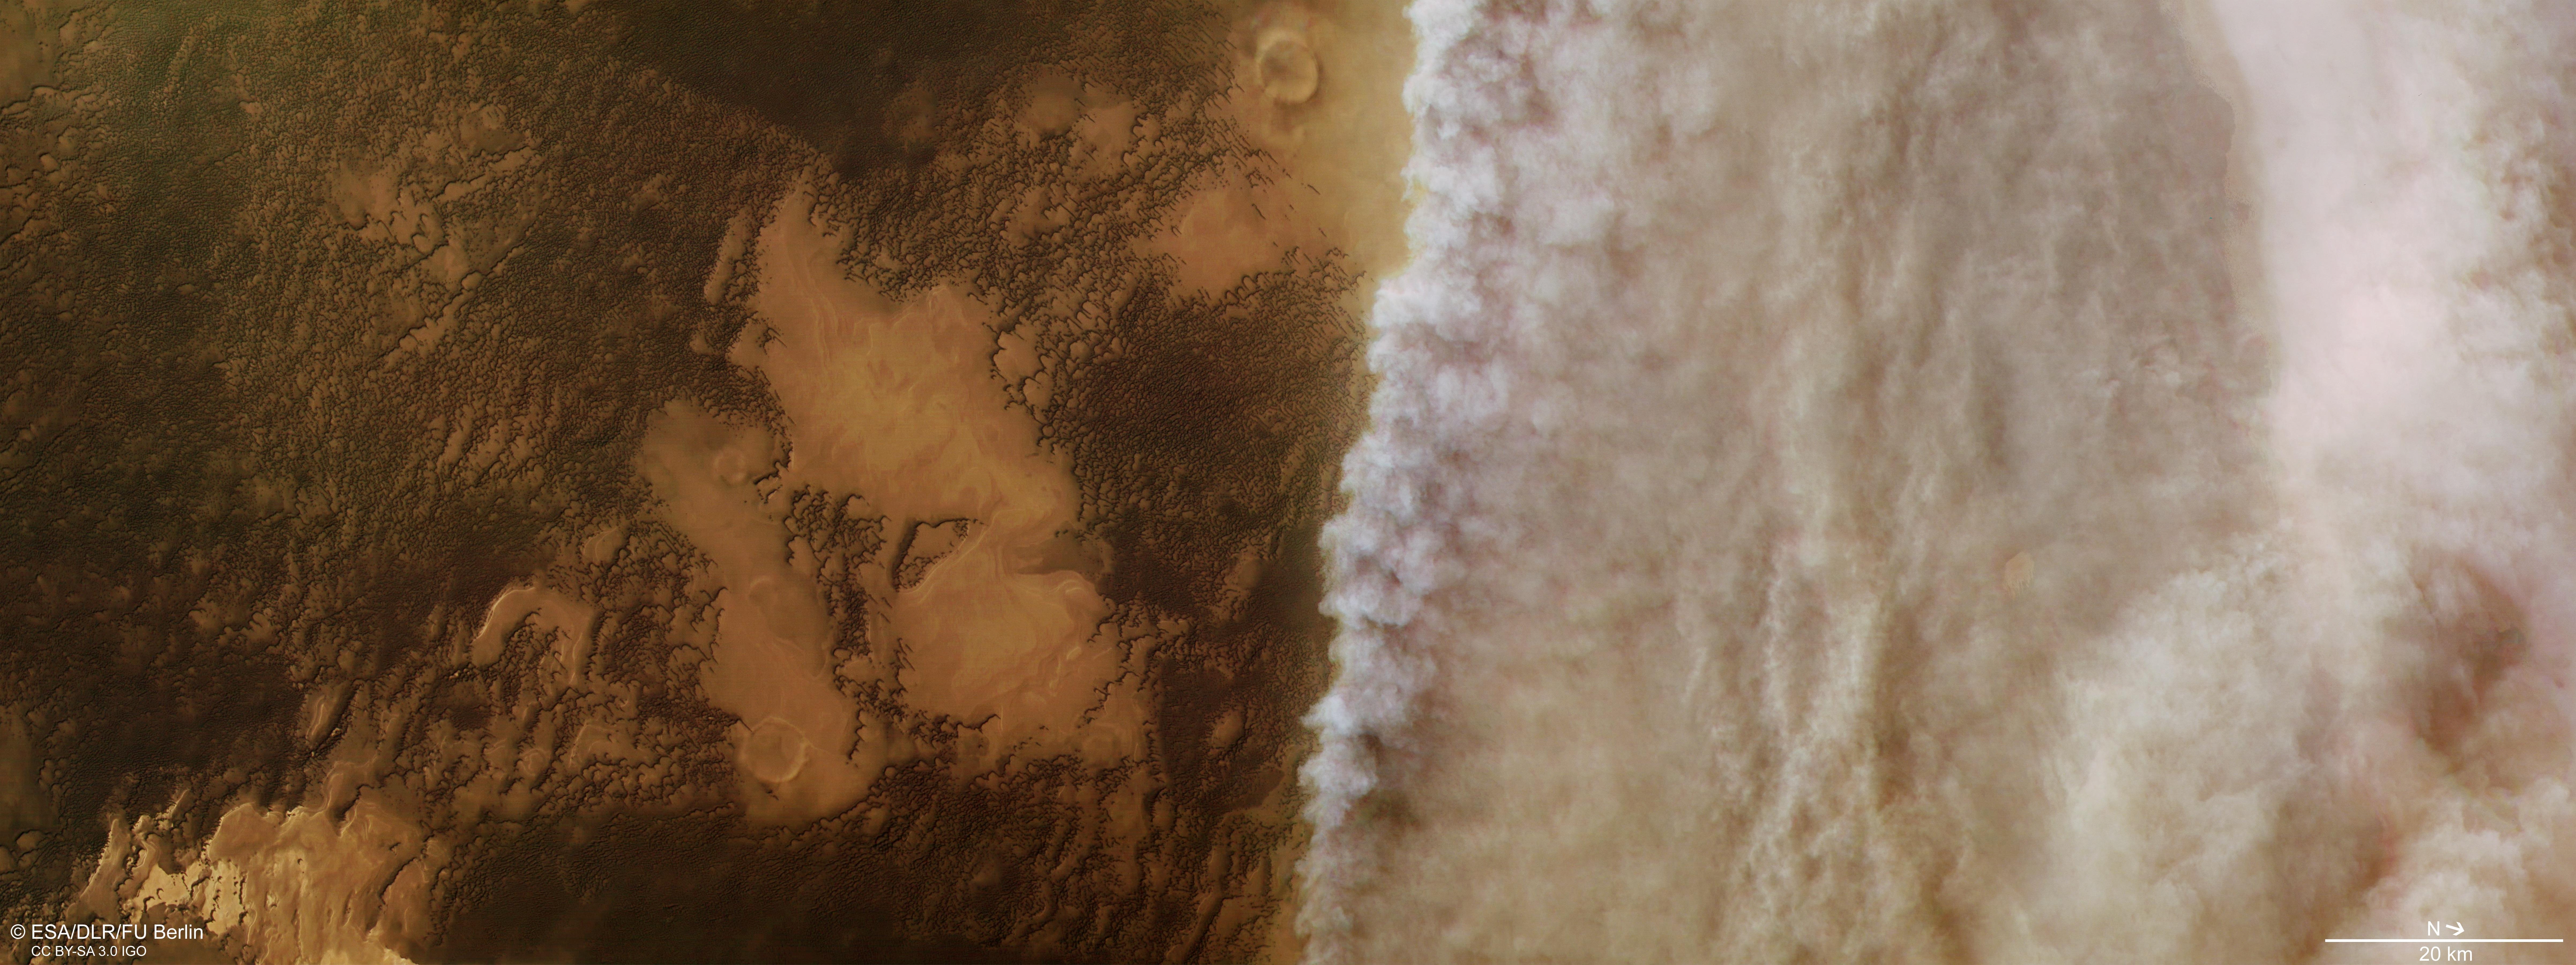 Mars_dust_storm.jpg